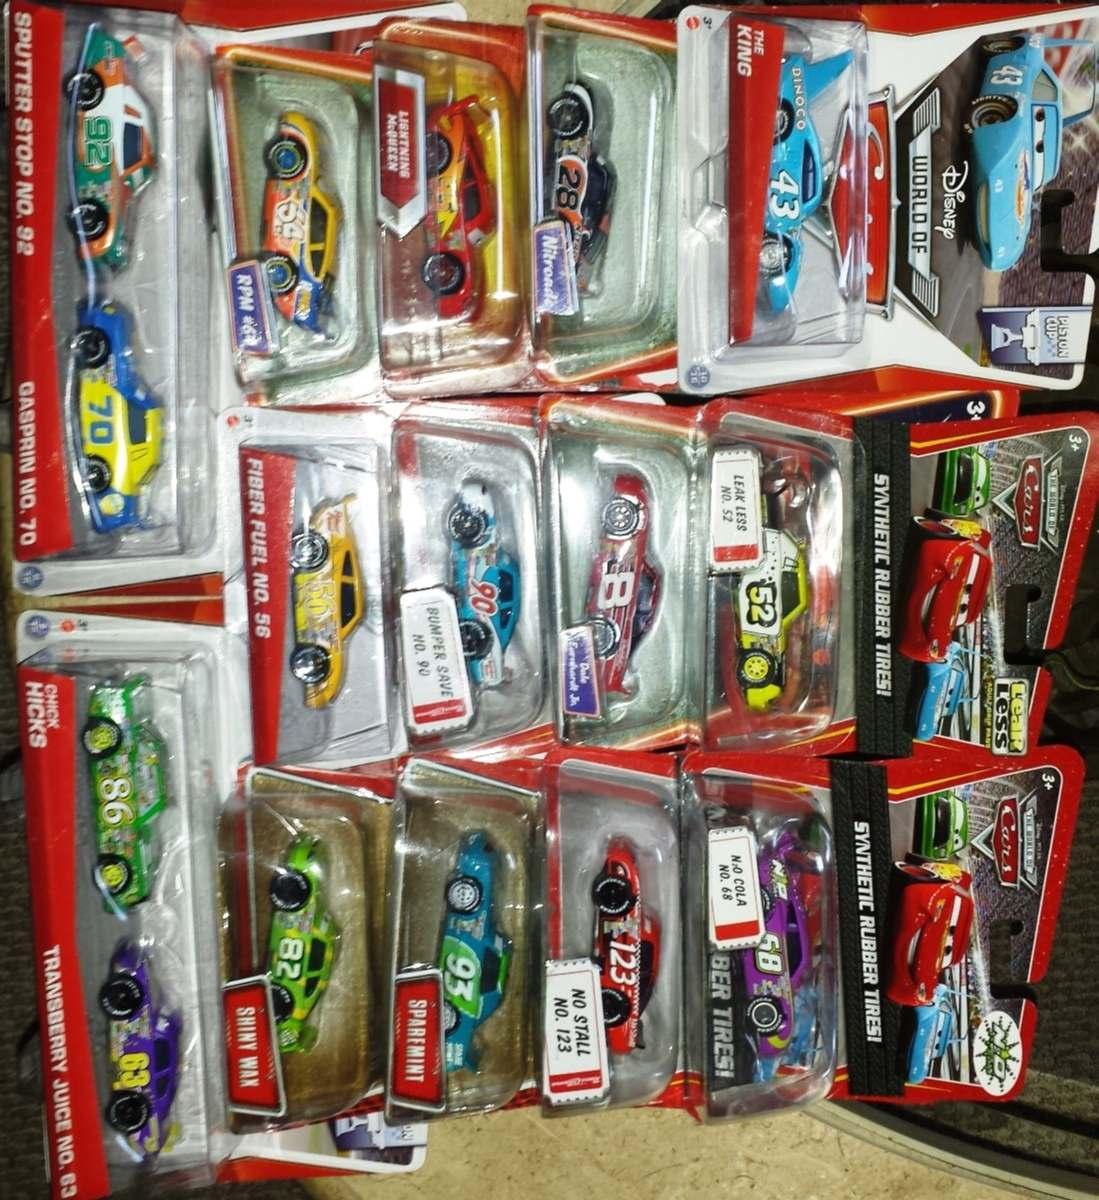 Cars disney corredores de cars 1 rey chick rpm no - Juguetes cars disney ...